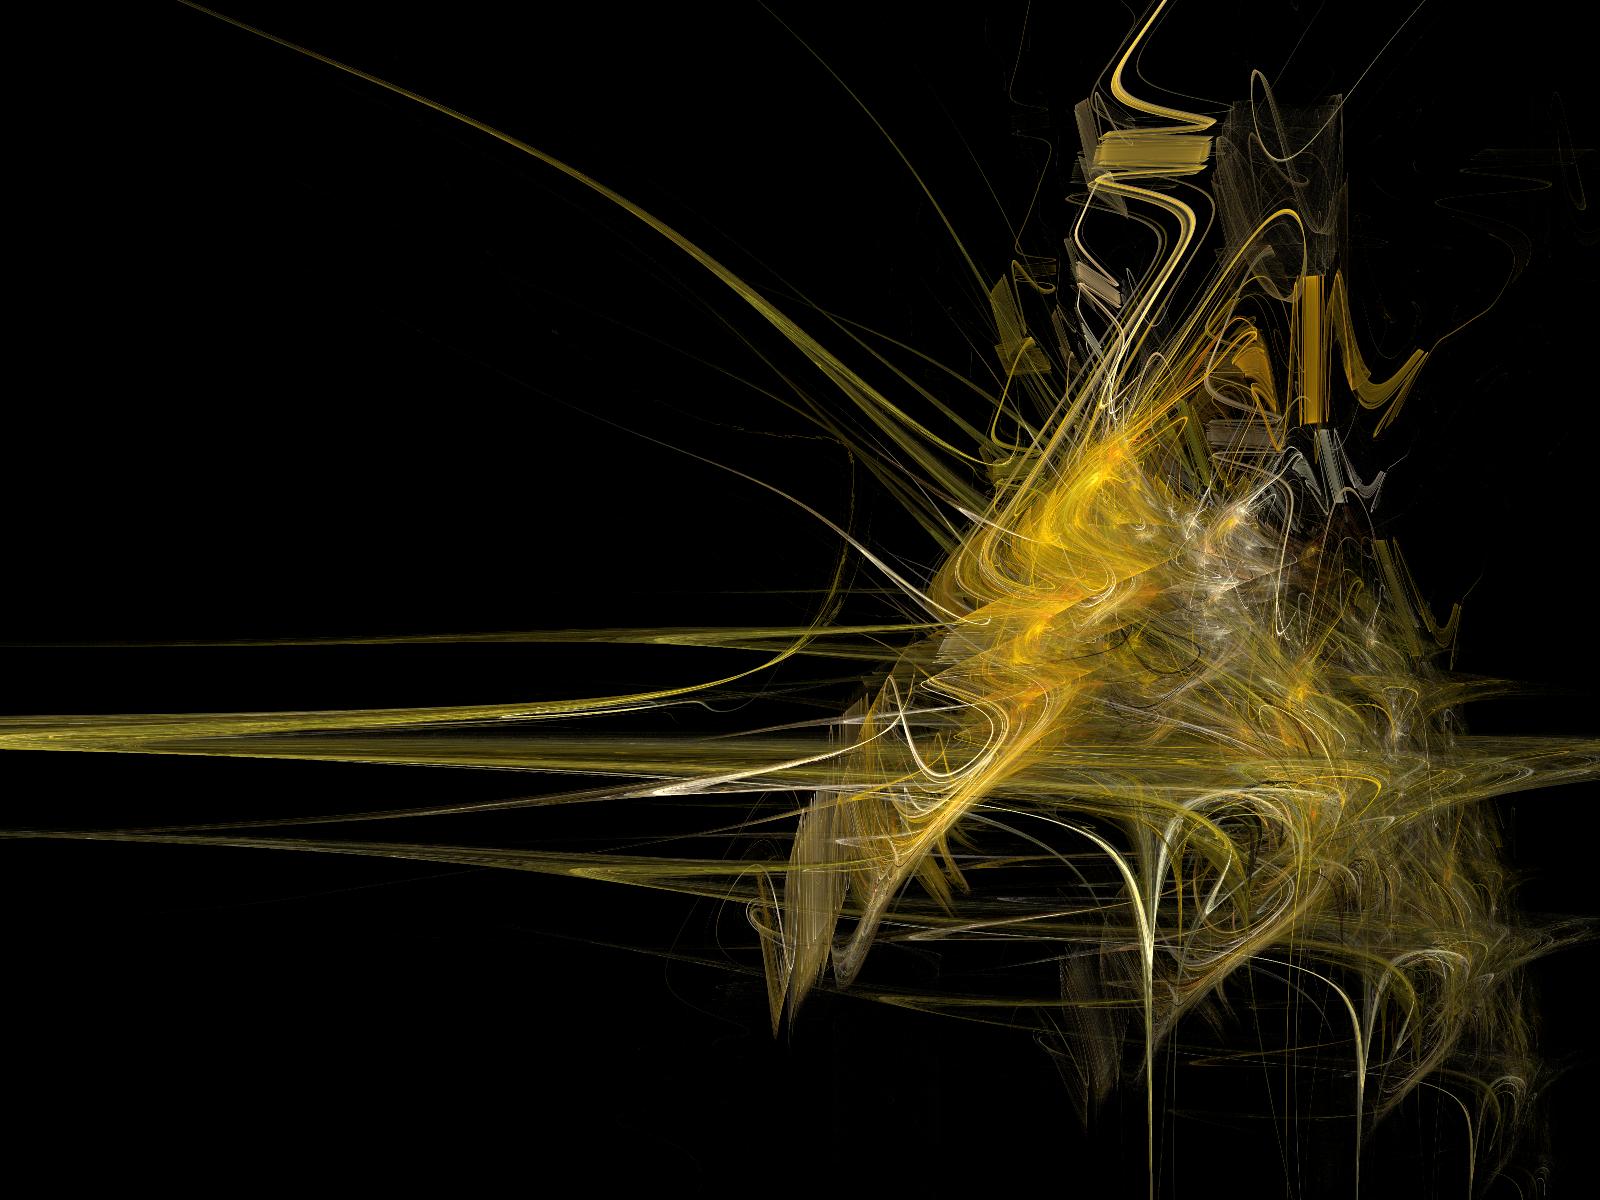 Black And Yellow Wallpaper Hd Wallpaper